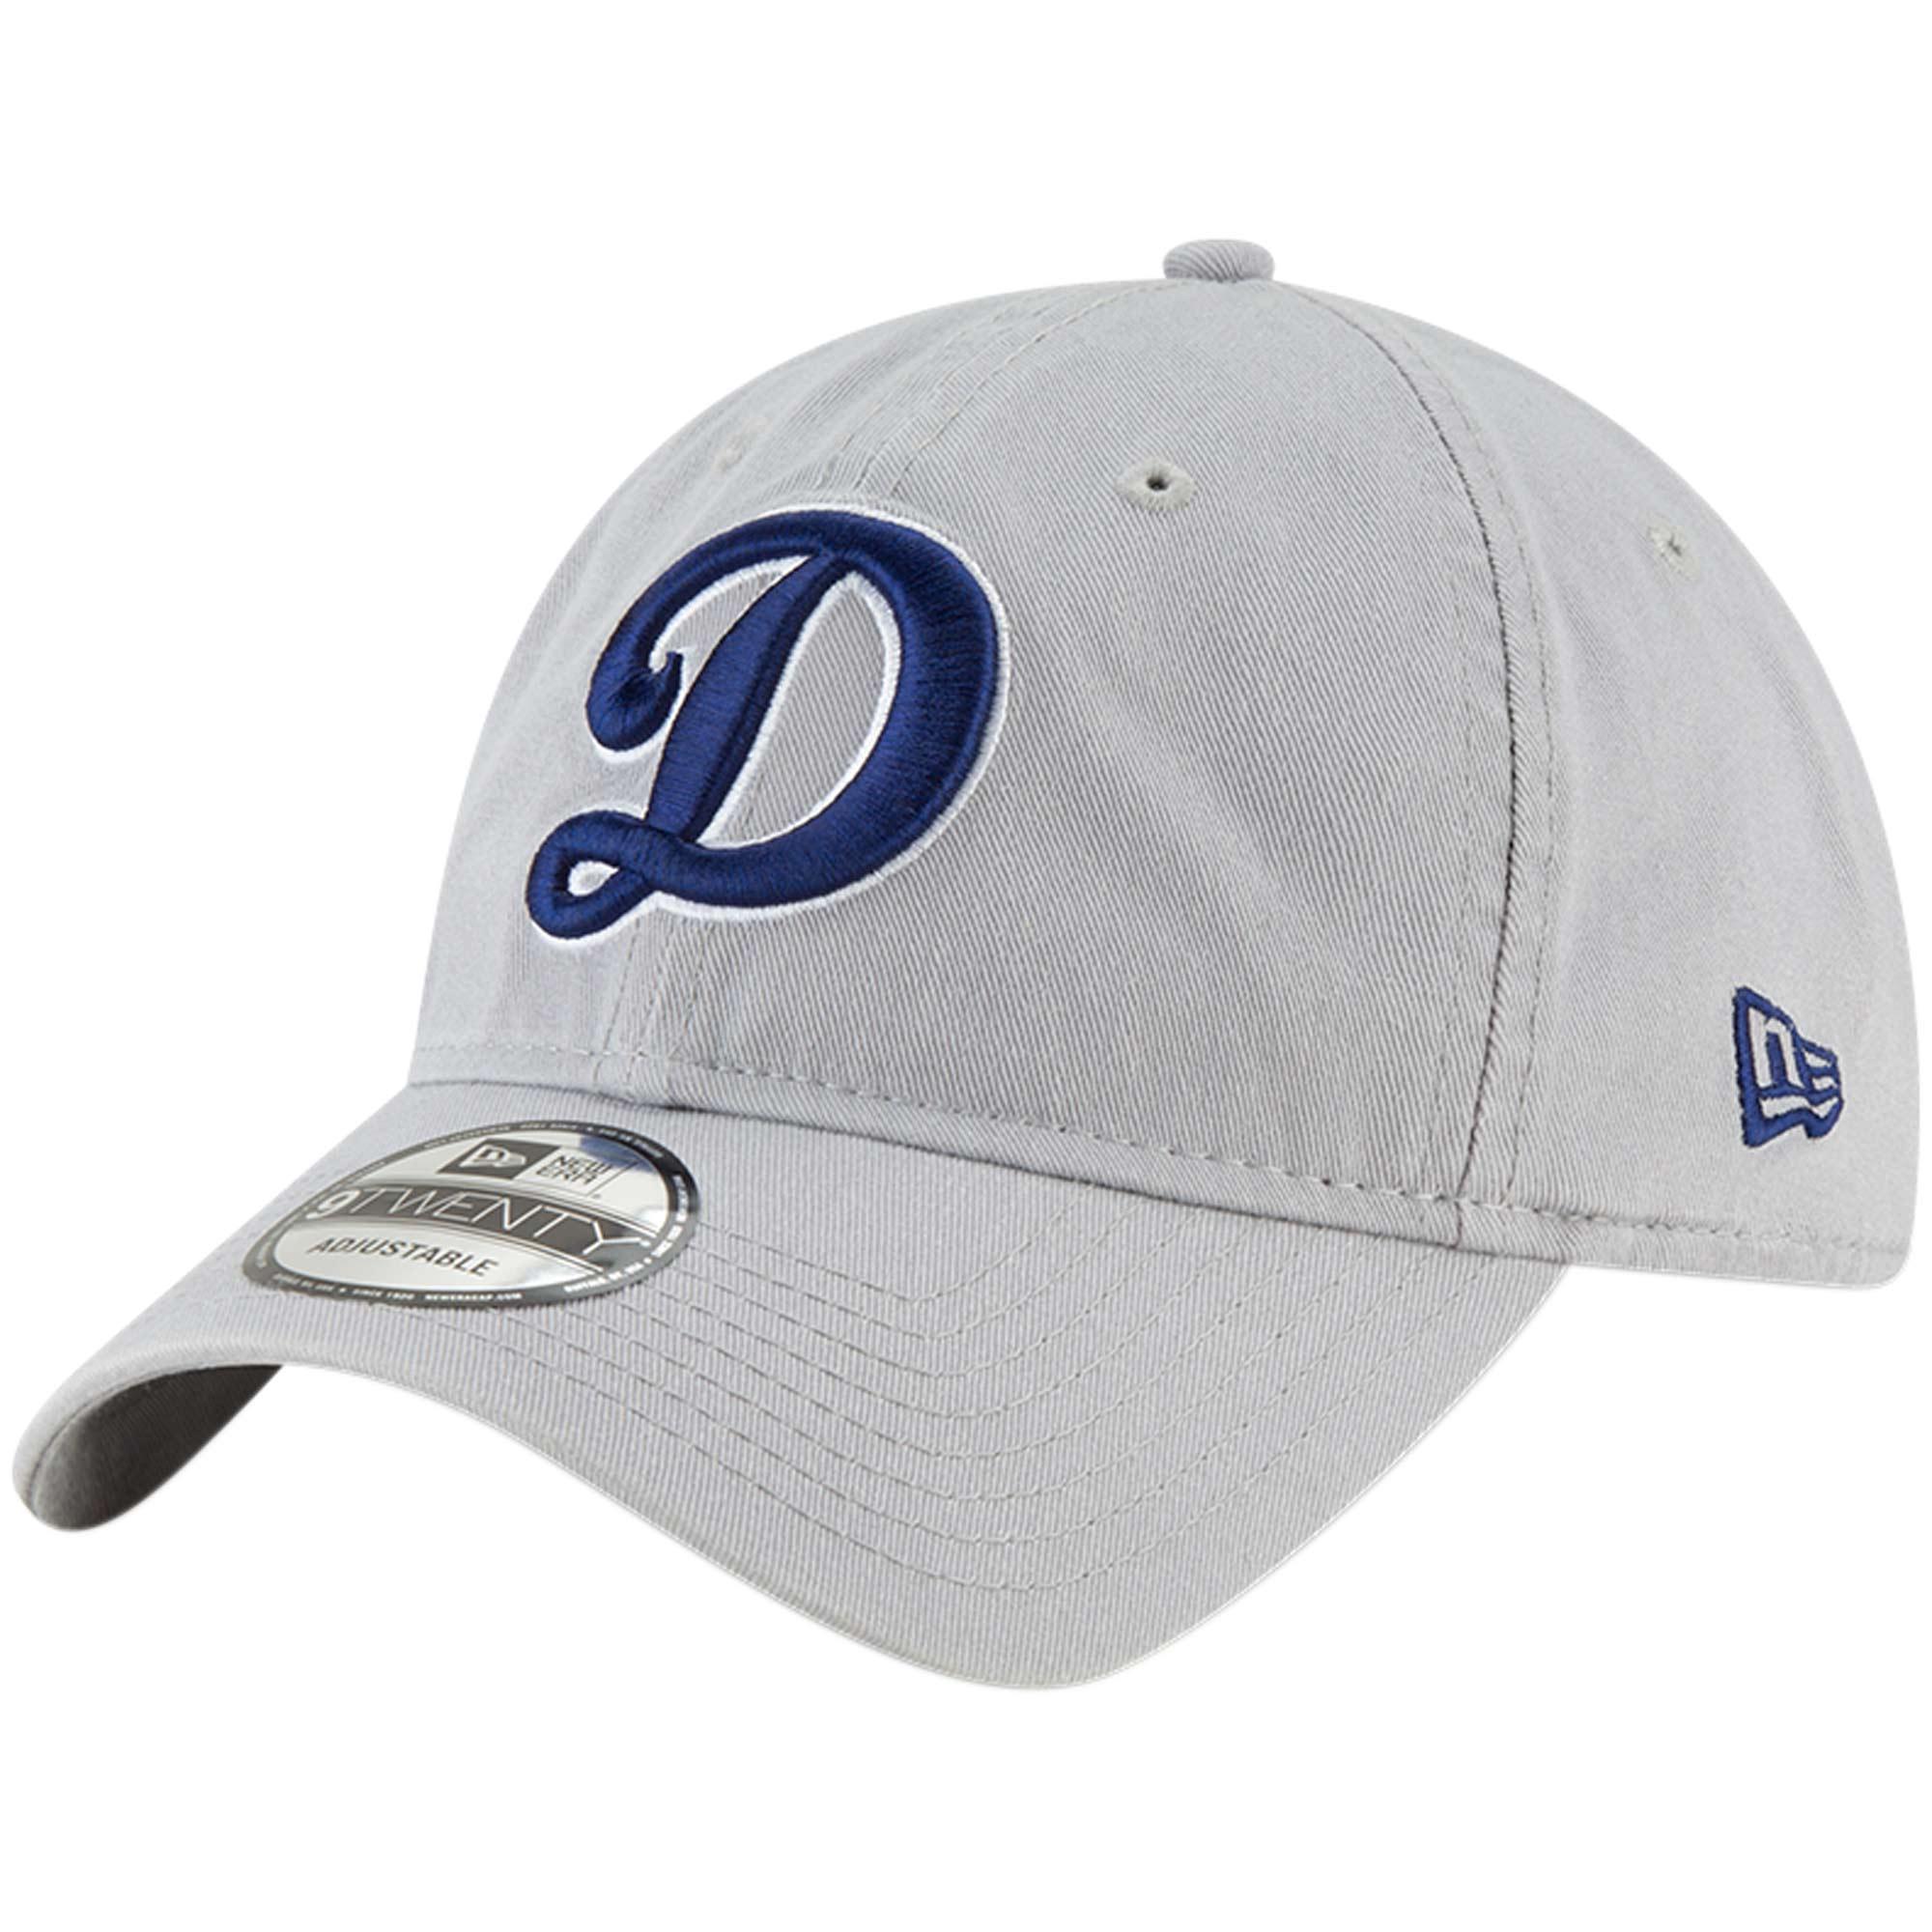 Los Angeles Dodgers New Era Core Classic OTC 9TWENTY Adjustable Hat - Gray - OSFA